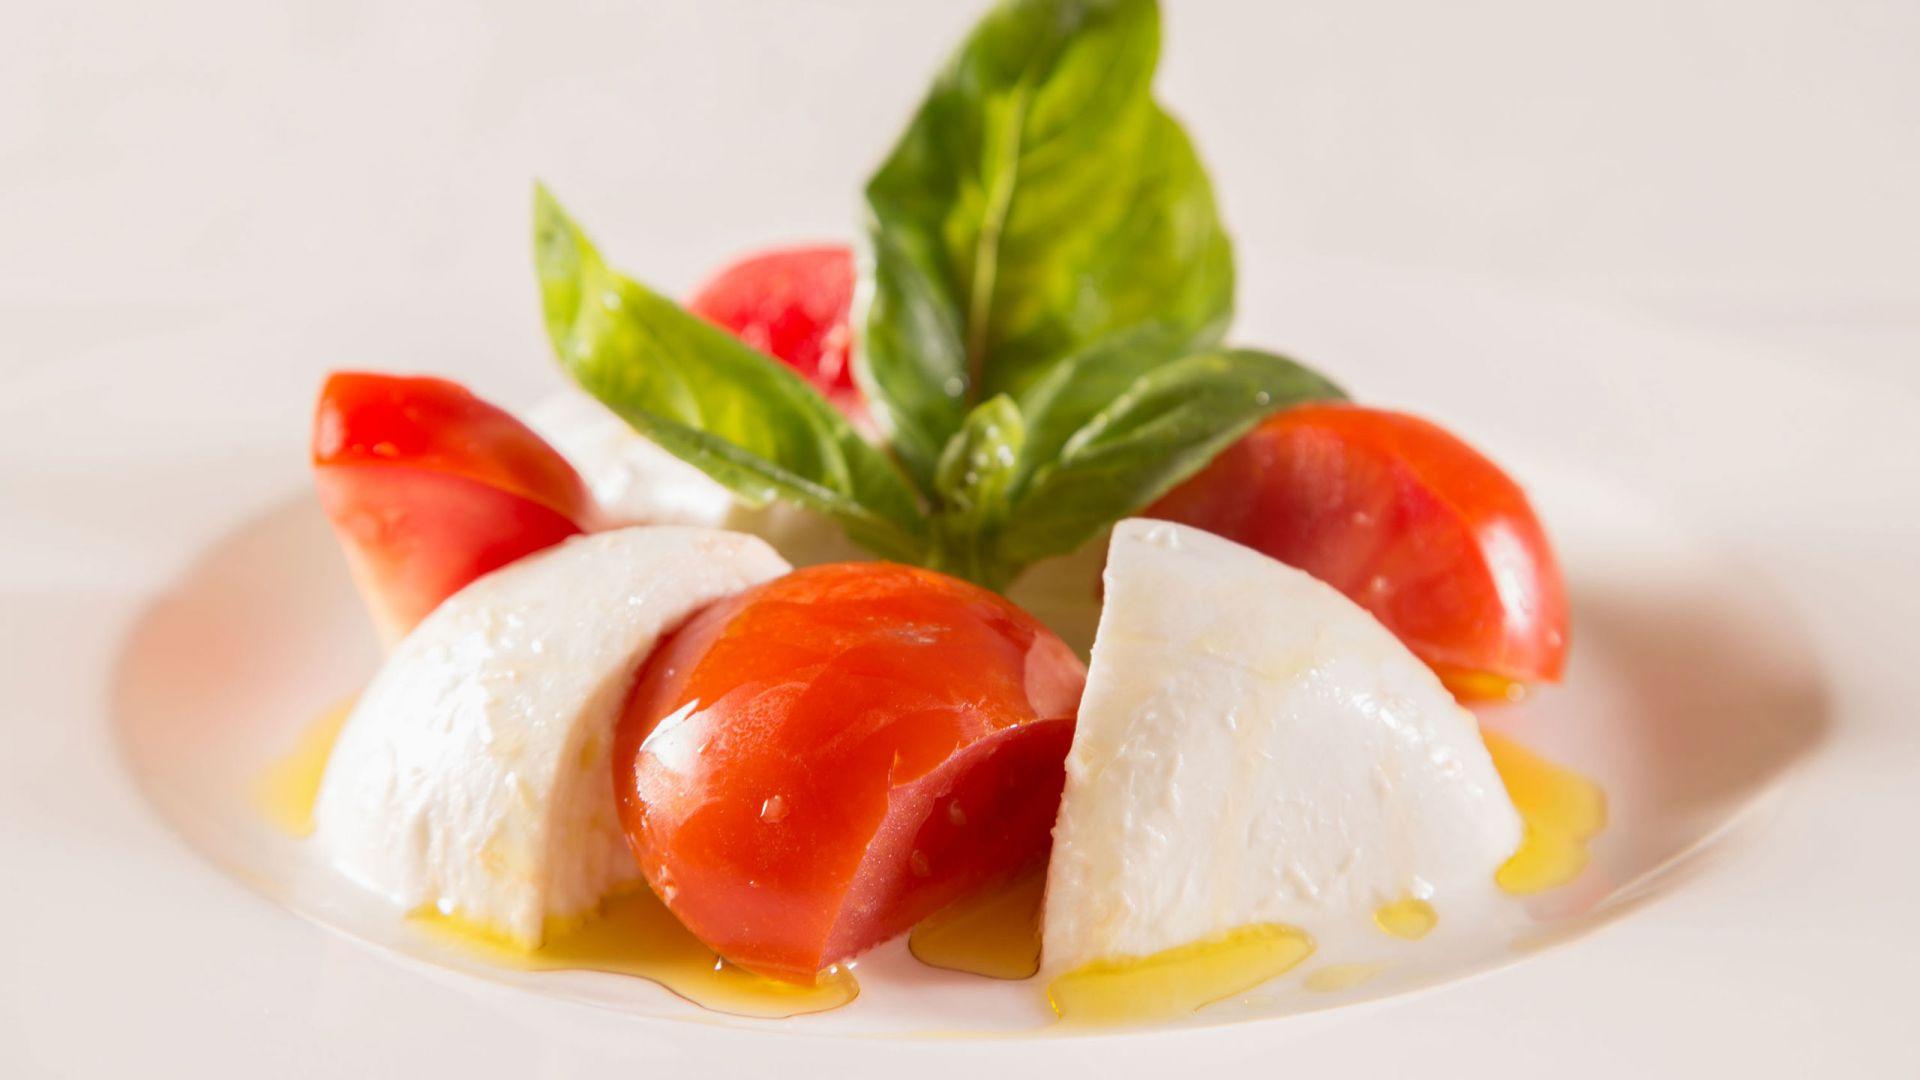 albergo-ottocento-rome-food-01